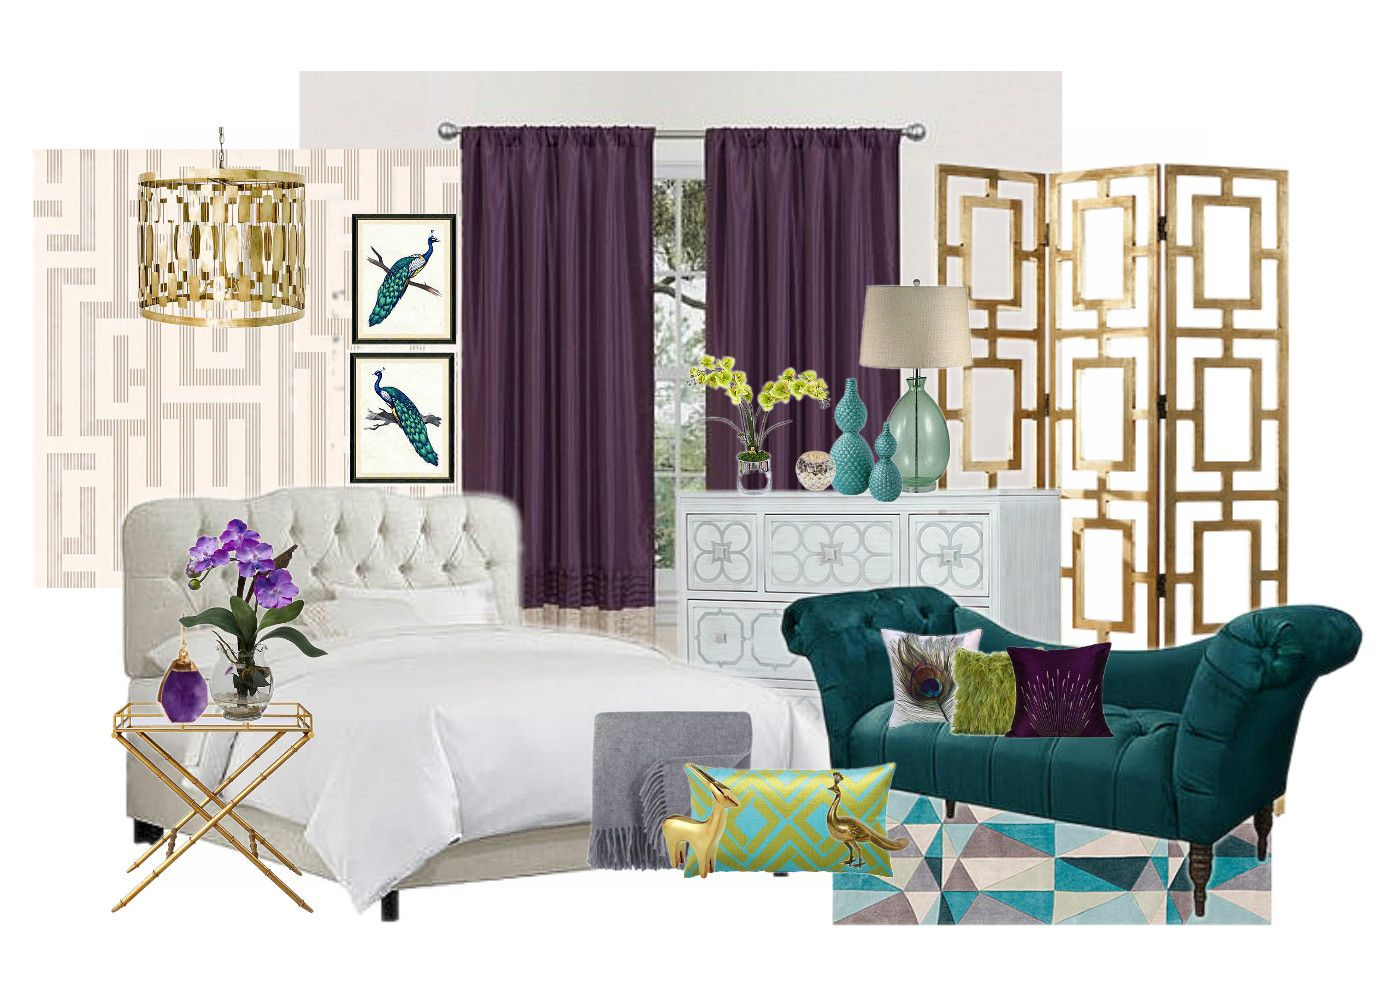 Peacock Inspired Bedroom